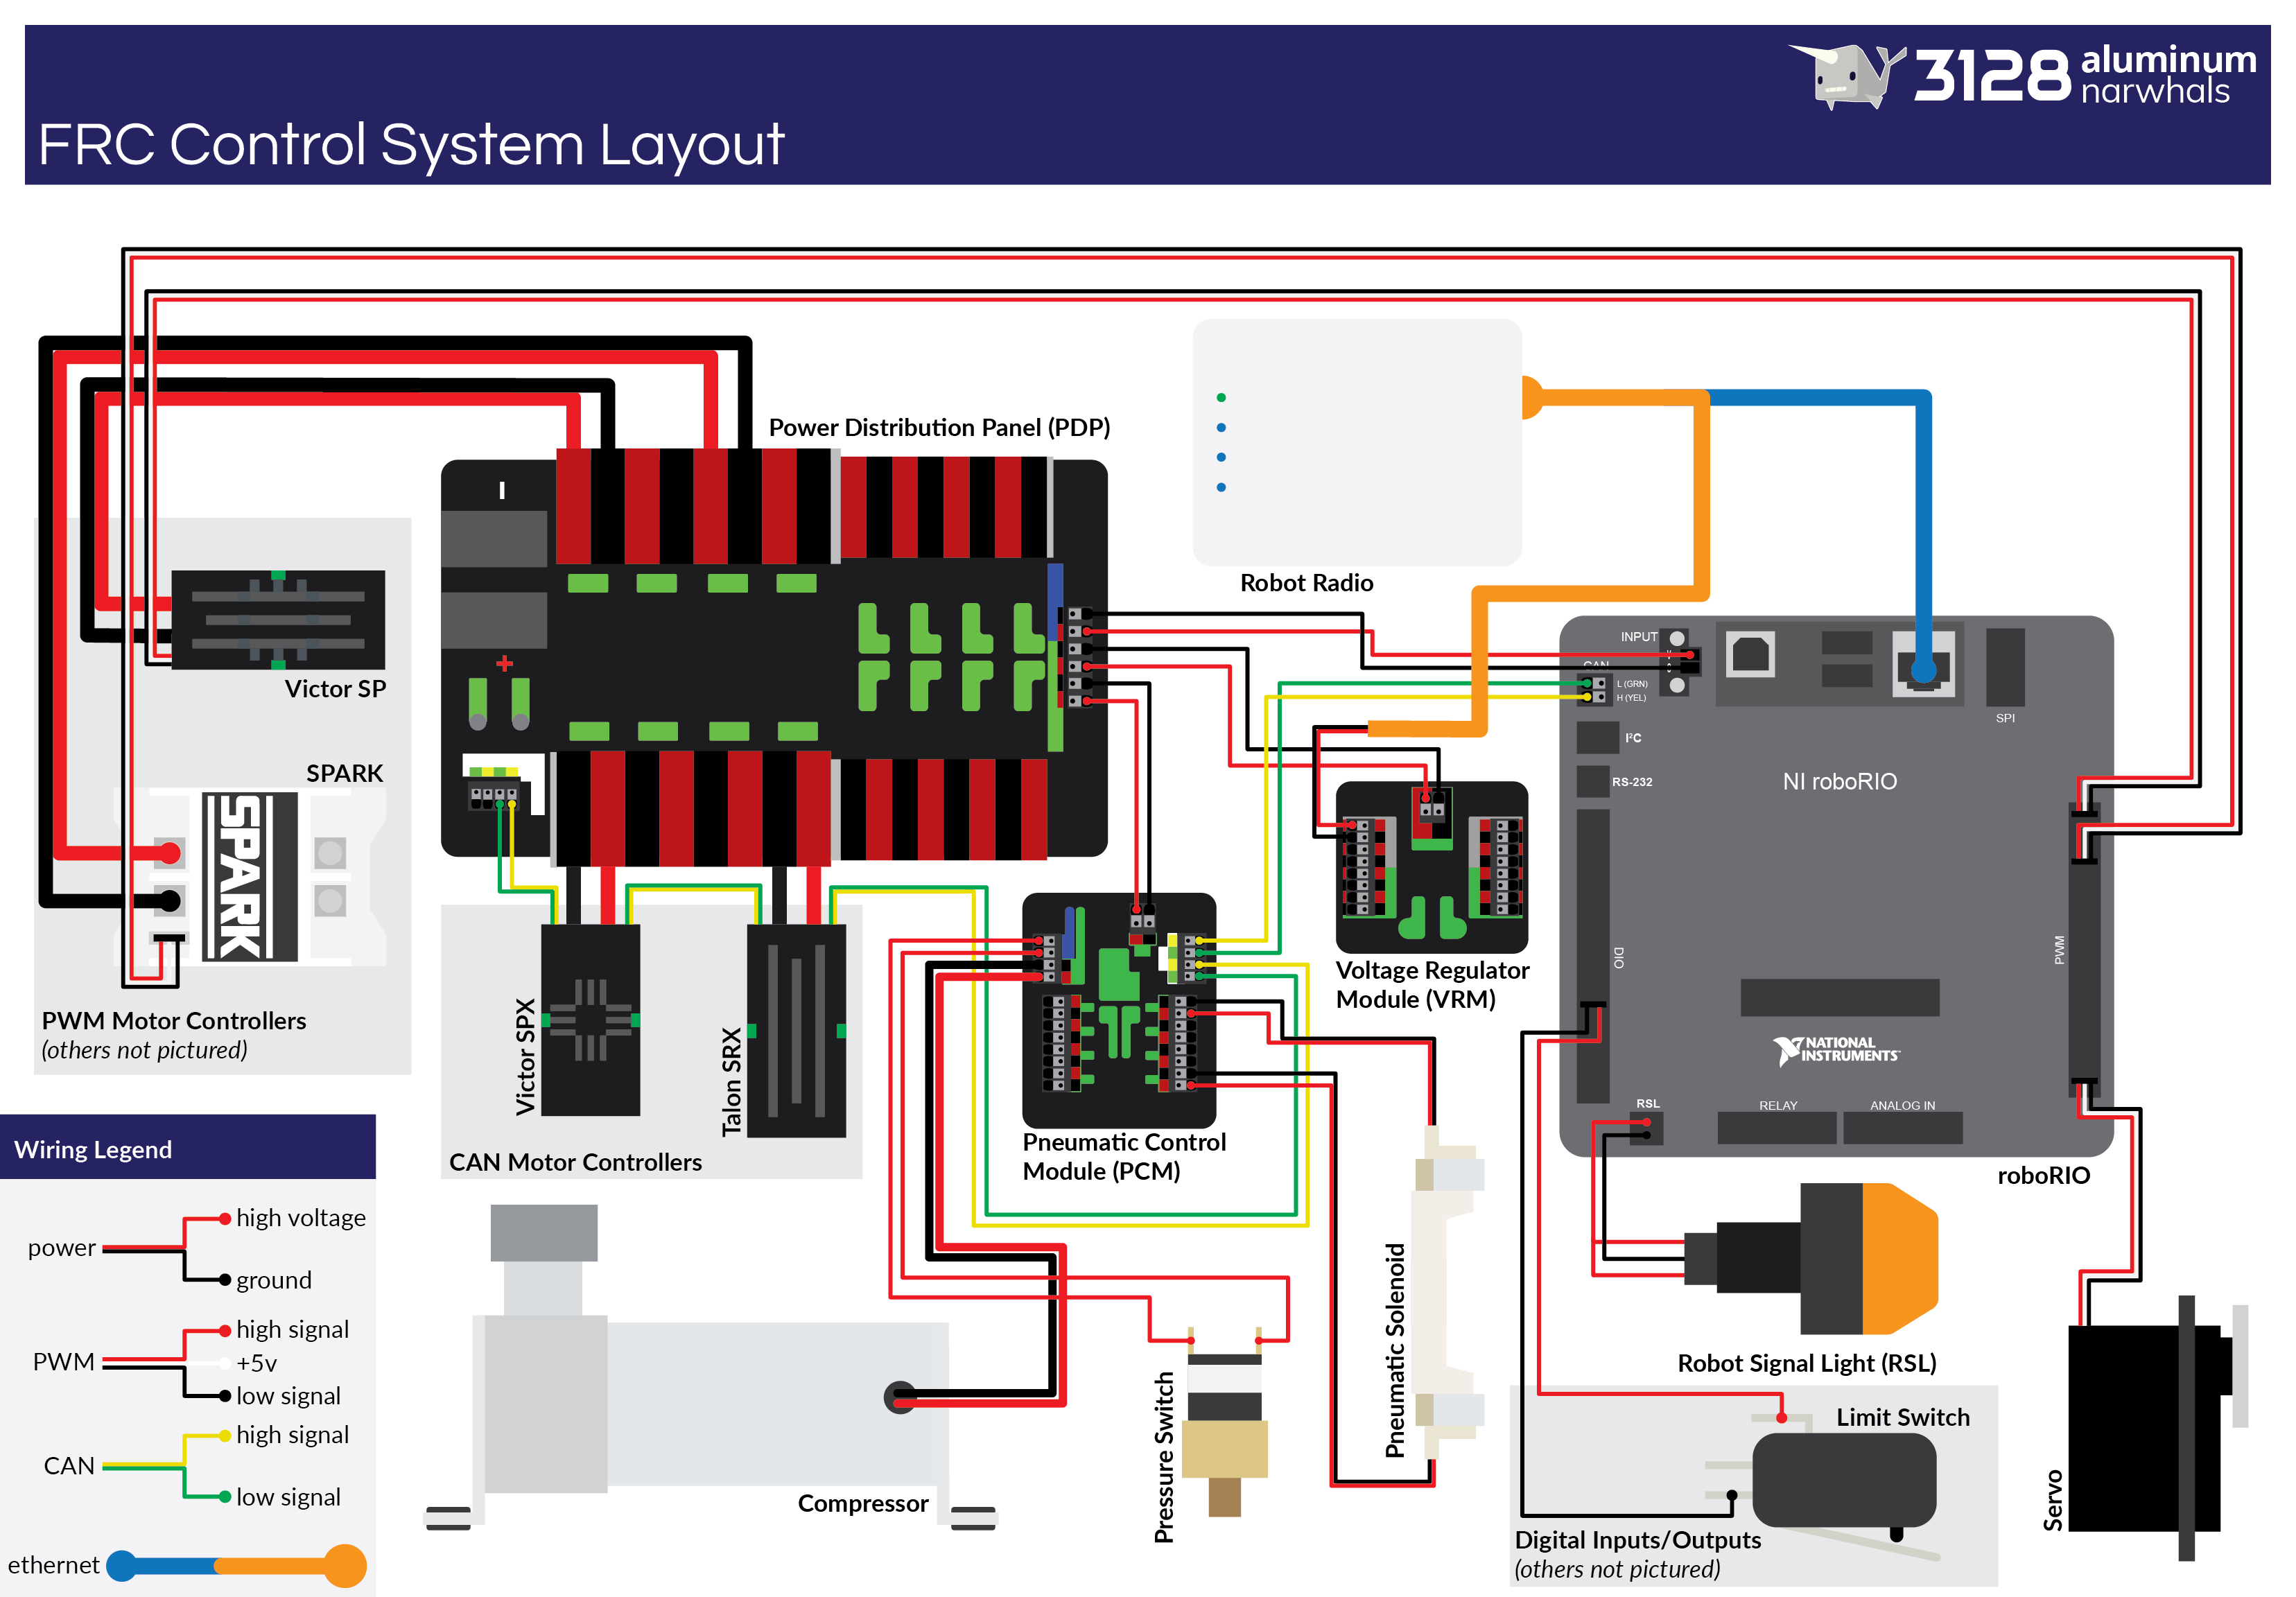 Pic: Upgraded Frc Control System Wiring Diagram - Cd-Media - Chief - Frc Wiring Diagram